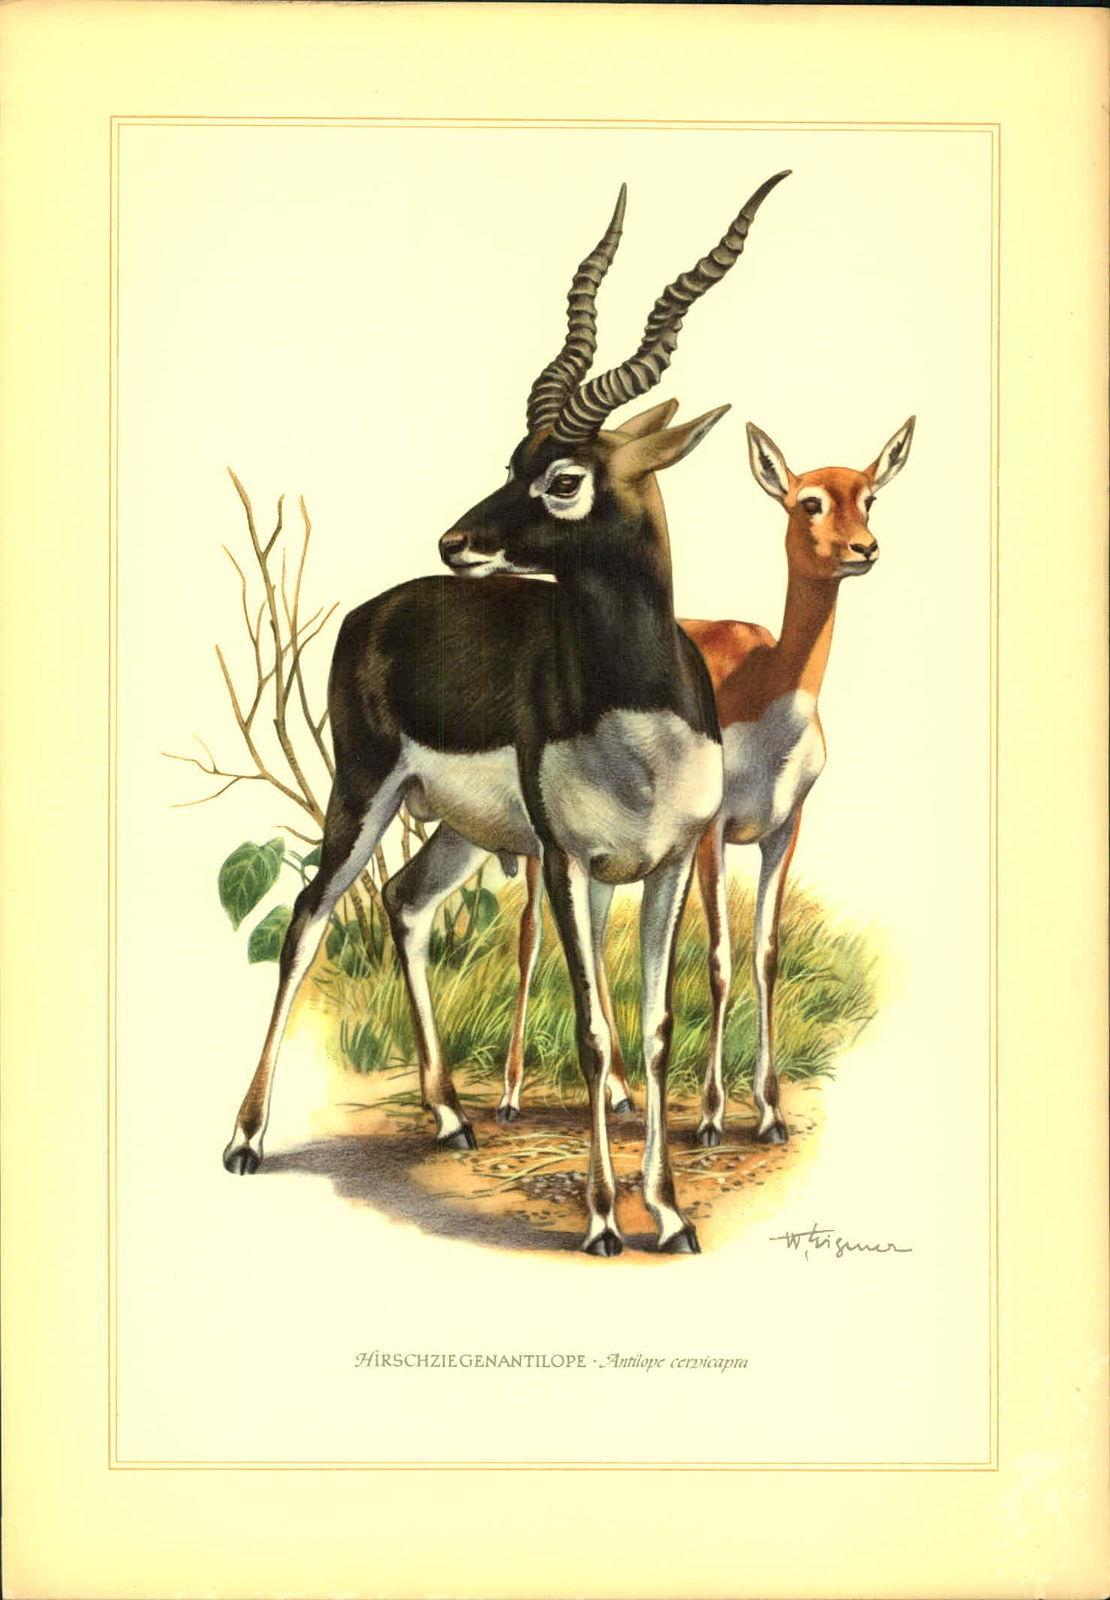 Hirschziegenantilope (Antilope cervicapra). Kunstdruck.